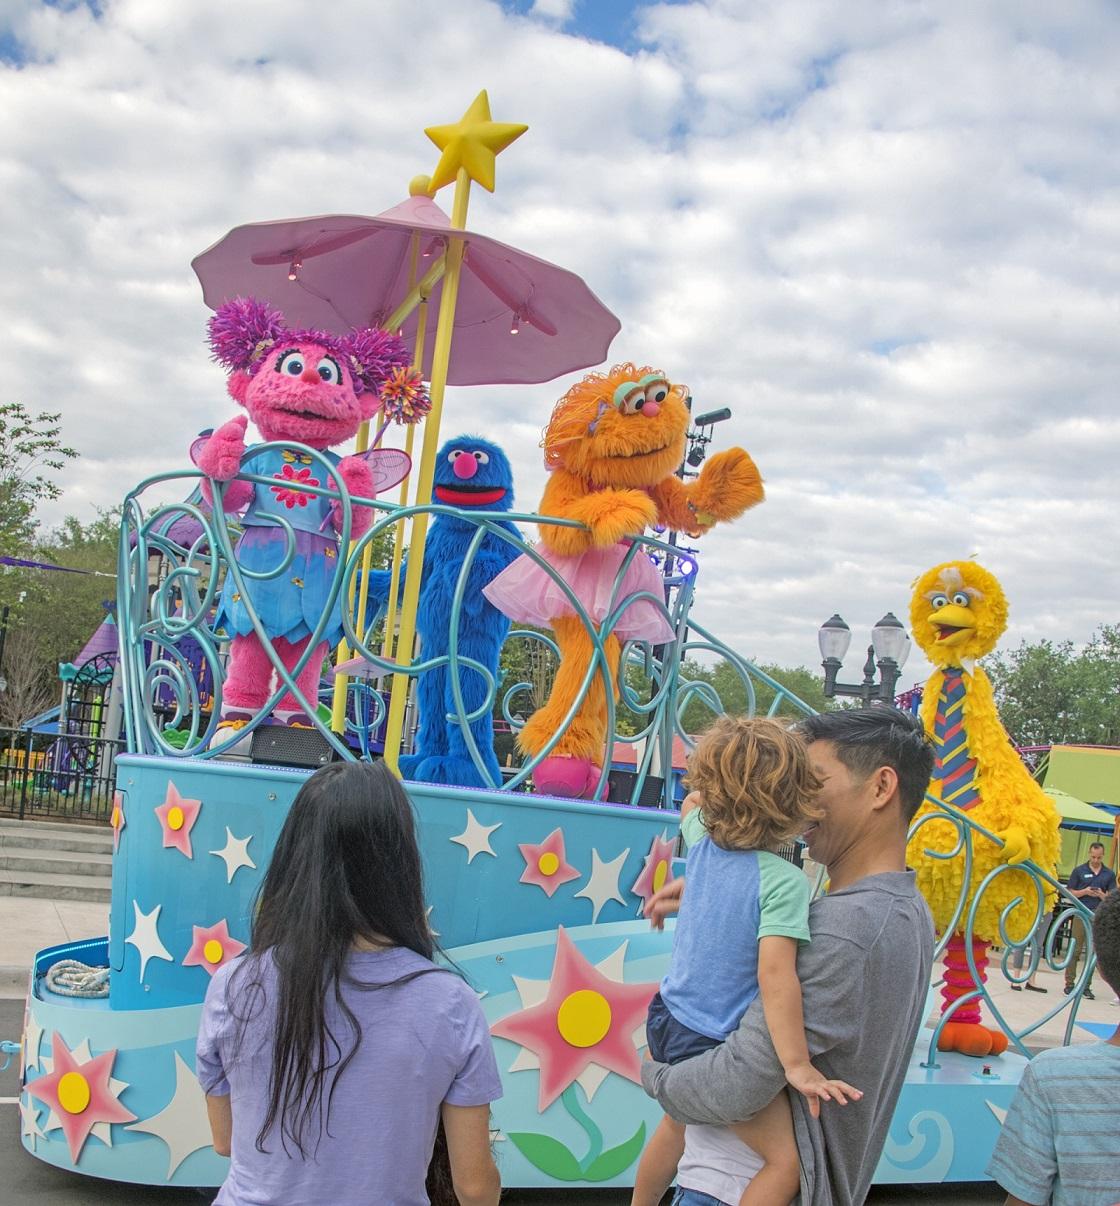 Sesamstraße In Seaworld Orlando Eröffnet Elmo Krümelmonster Und